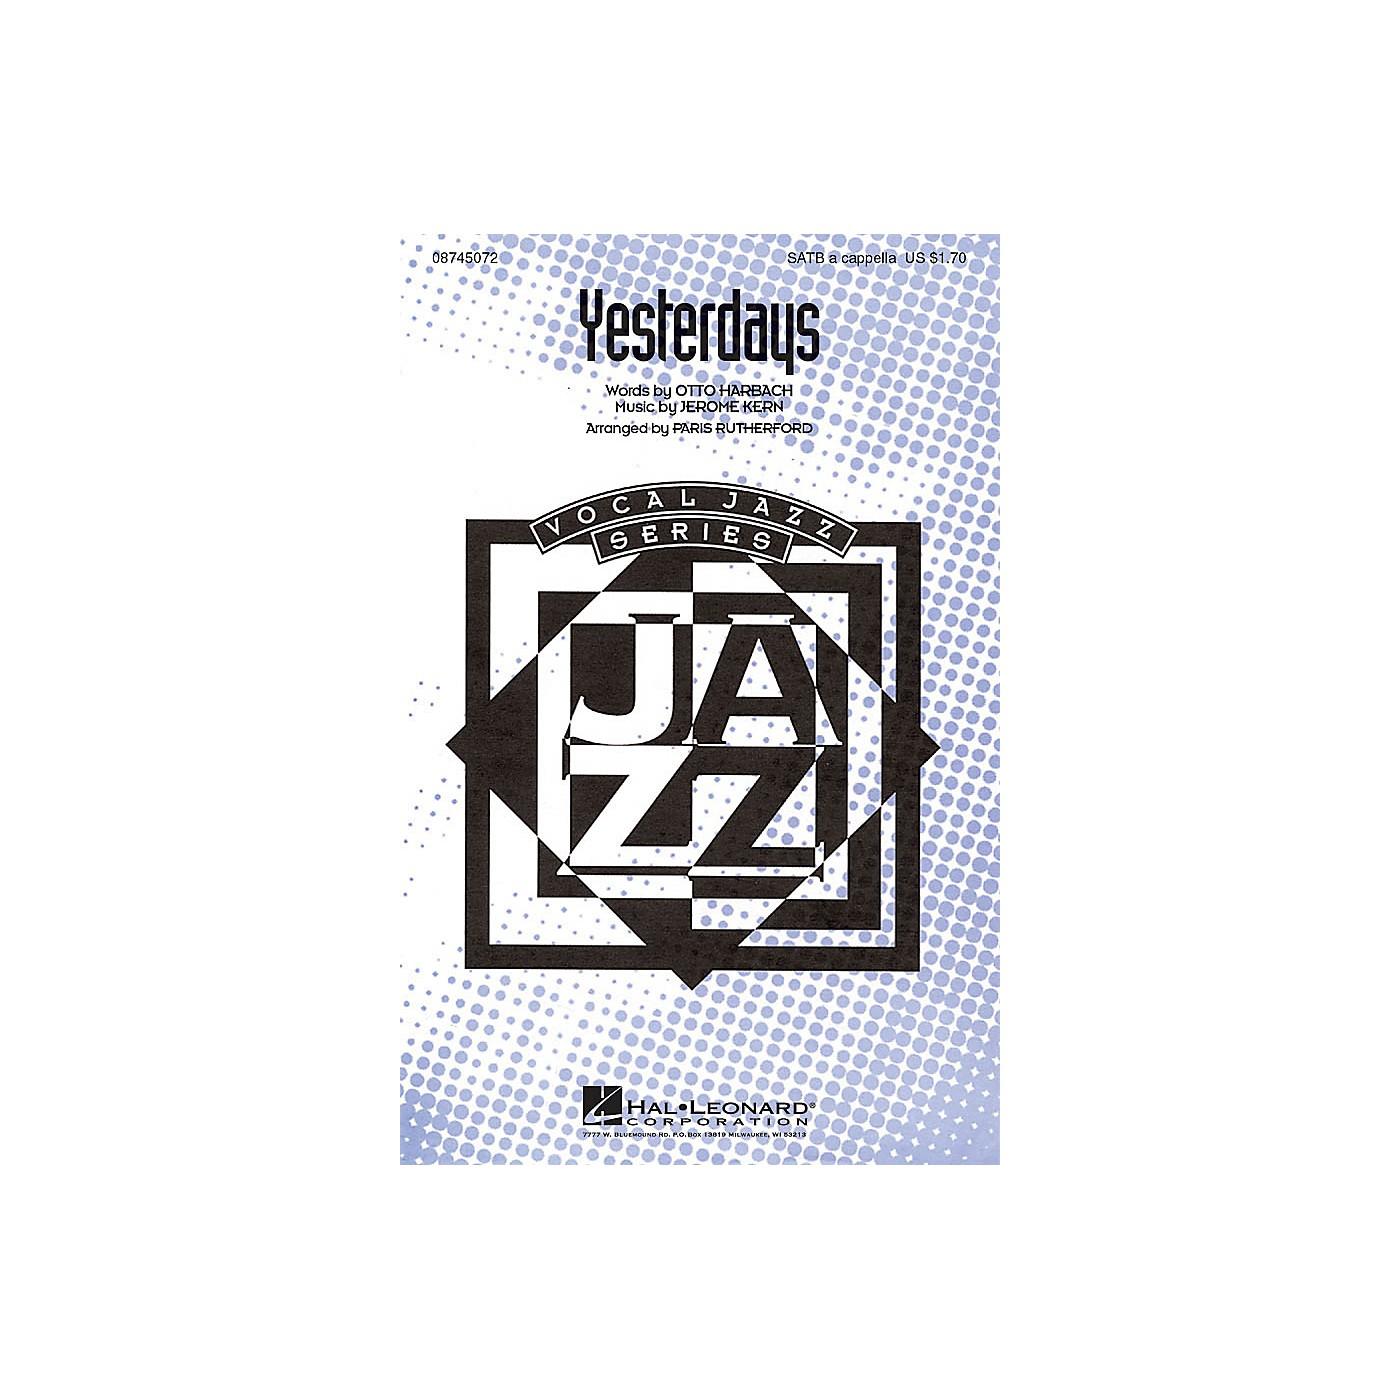 Hal Leonard Yesterdays SATB a cappella arranged by Paris Rutherford thumbnail